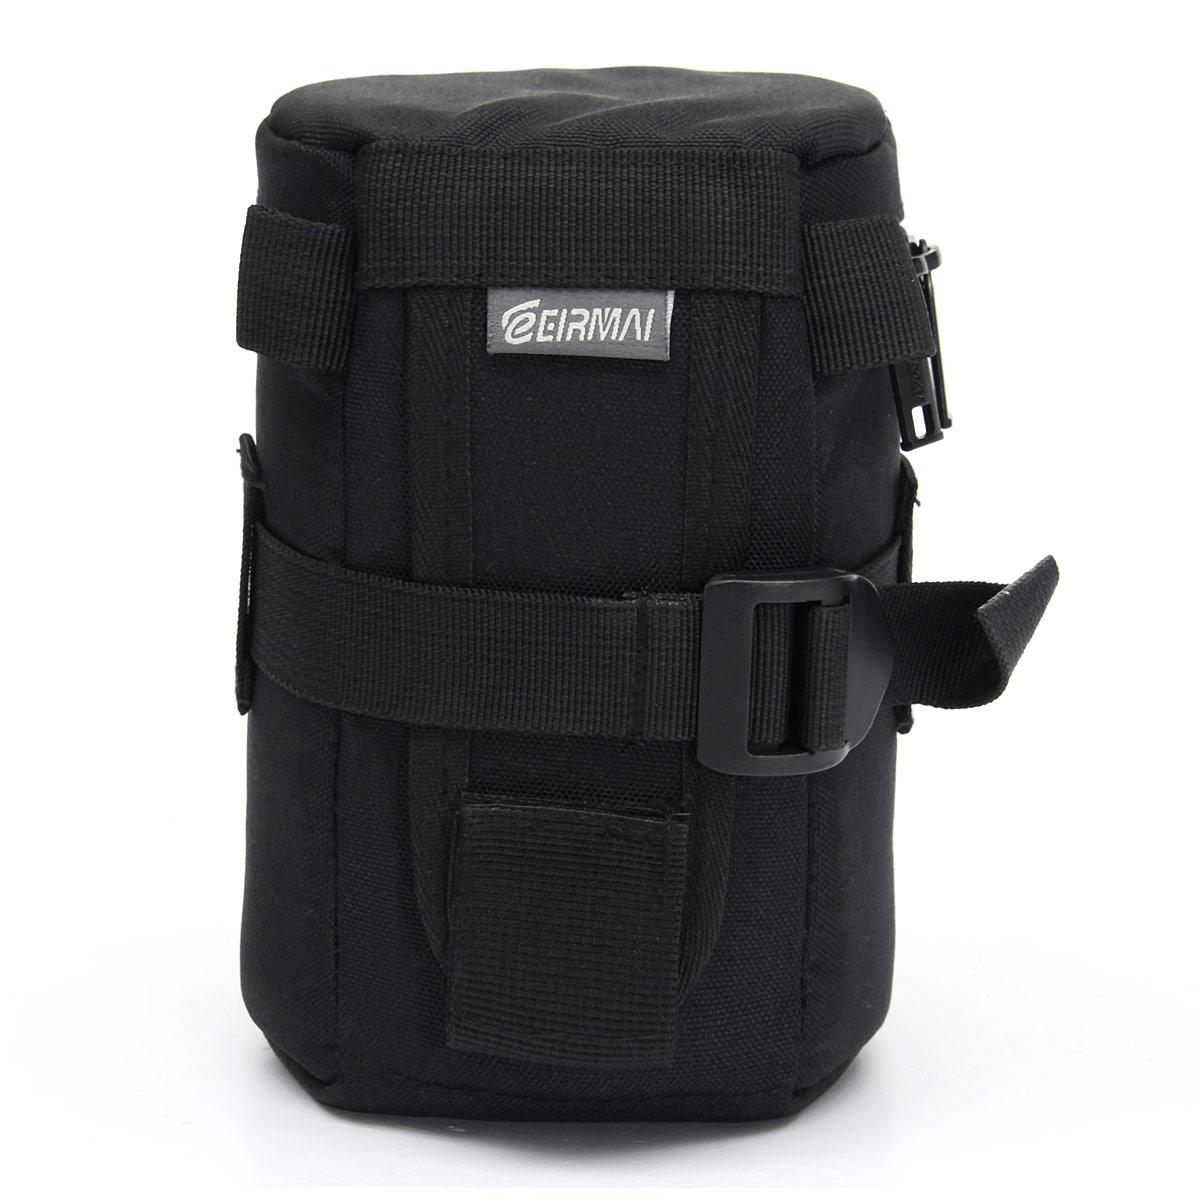 Camera Travel Pouch : Universal camera lens waist belt protector case insert bag